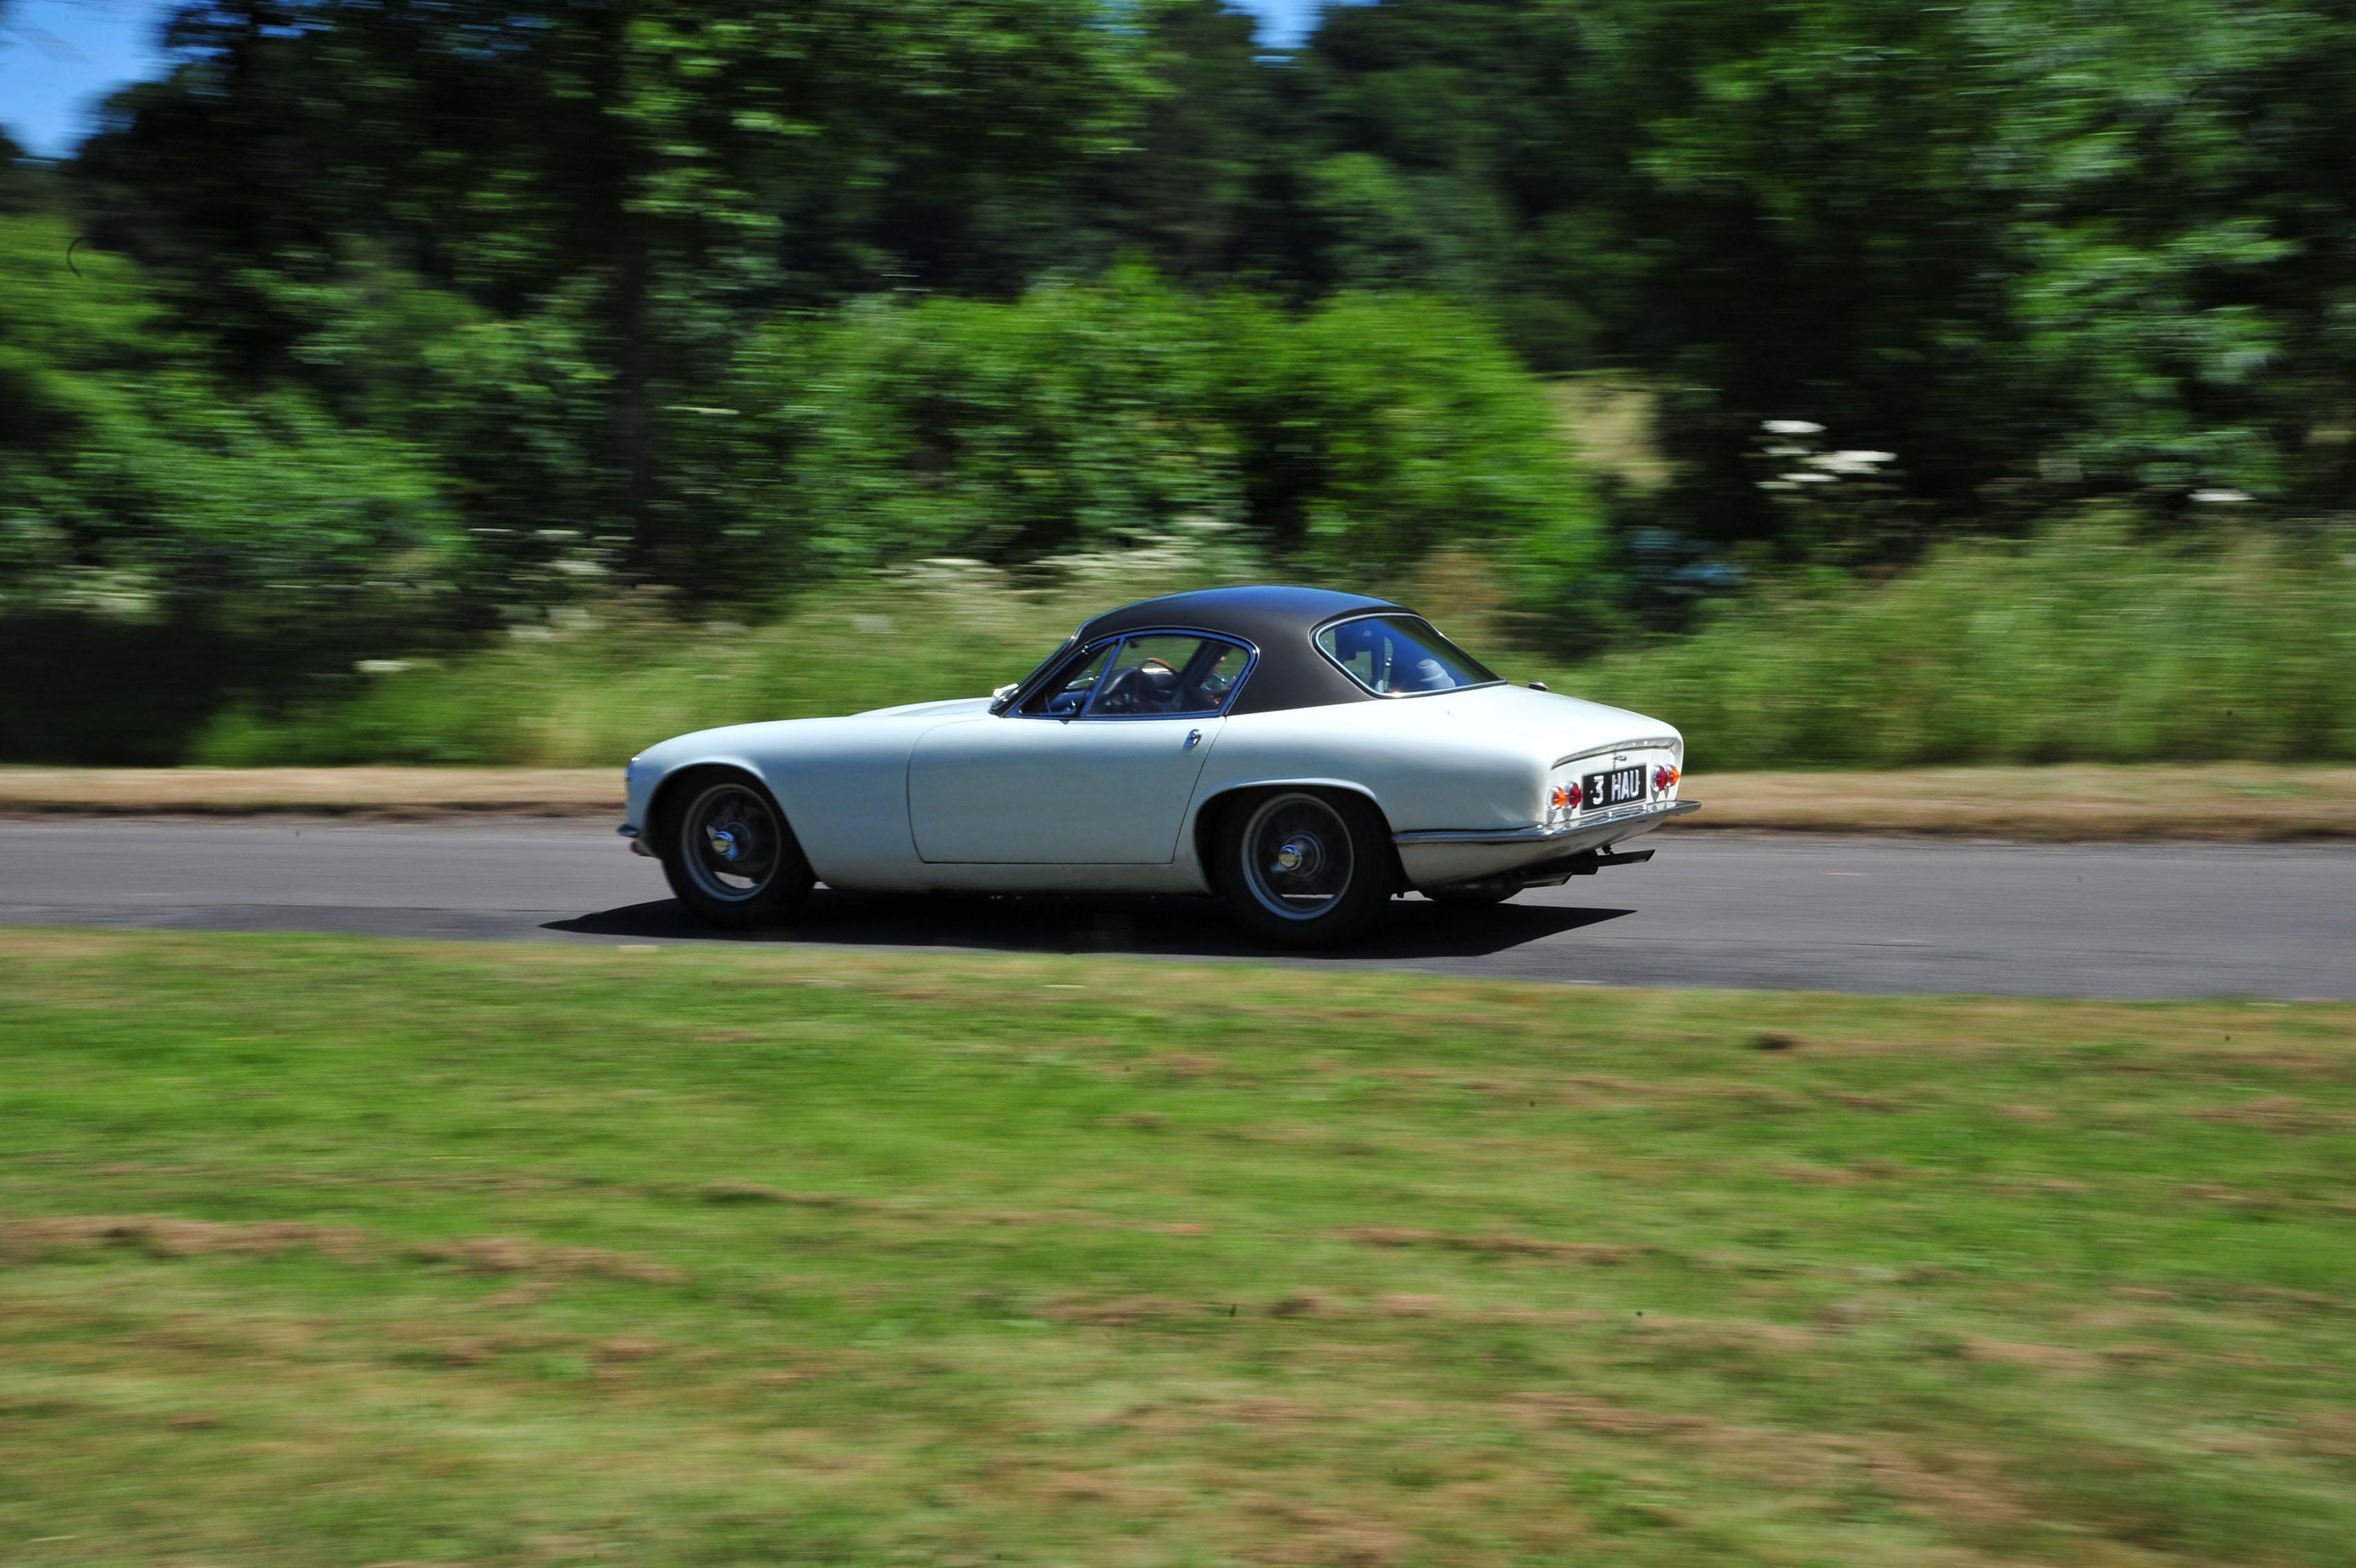 1961 Type 14 Lotus Elite Driving on twisty road